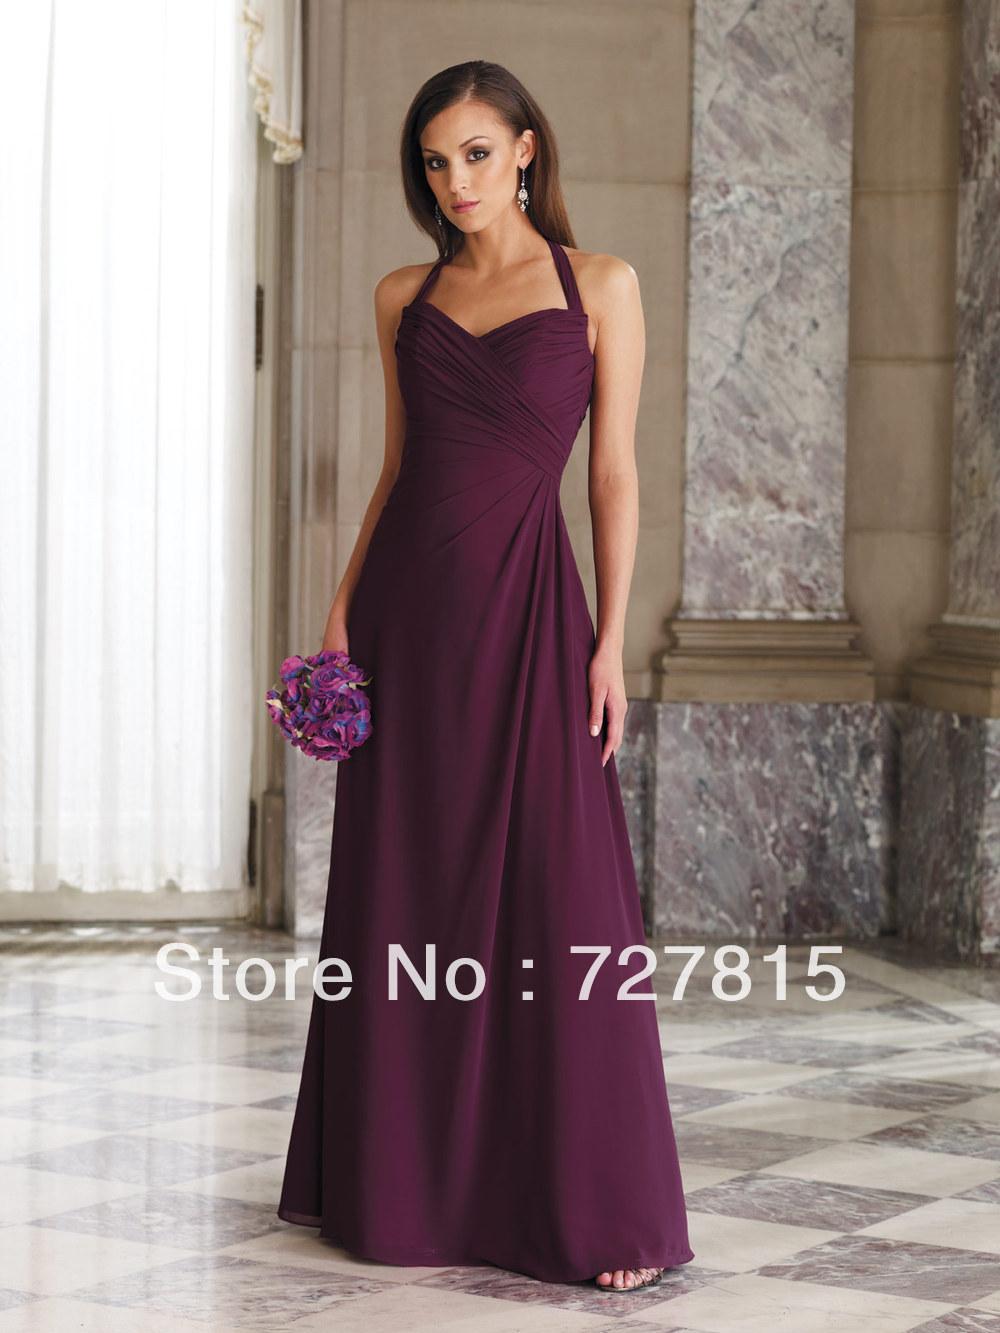 Popular Eggplant Bridesmaid Dresses Buy Cheap Eggplant Bridesmaid Dresses Lots From China